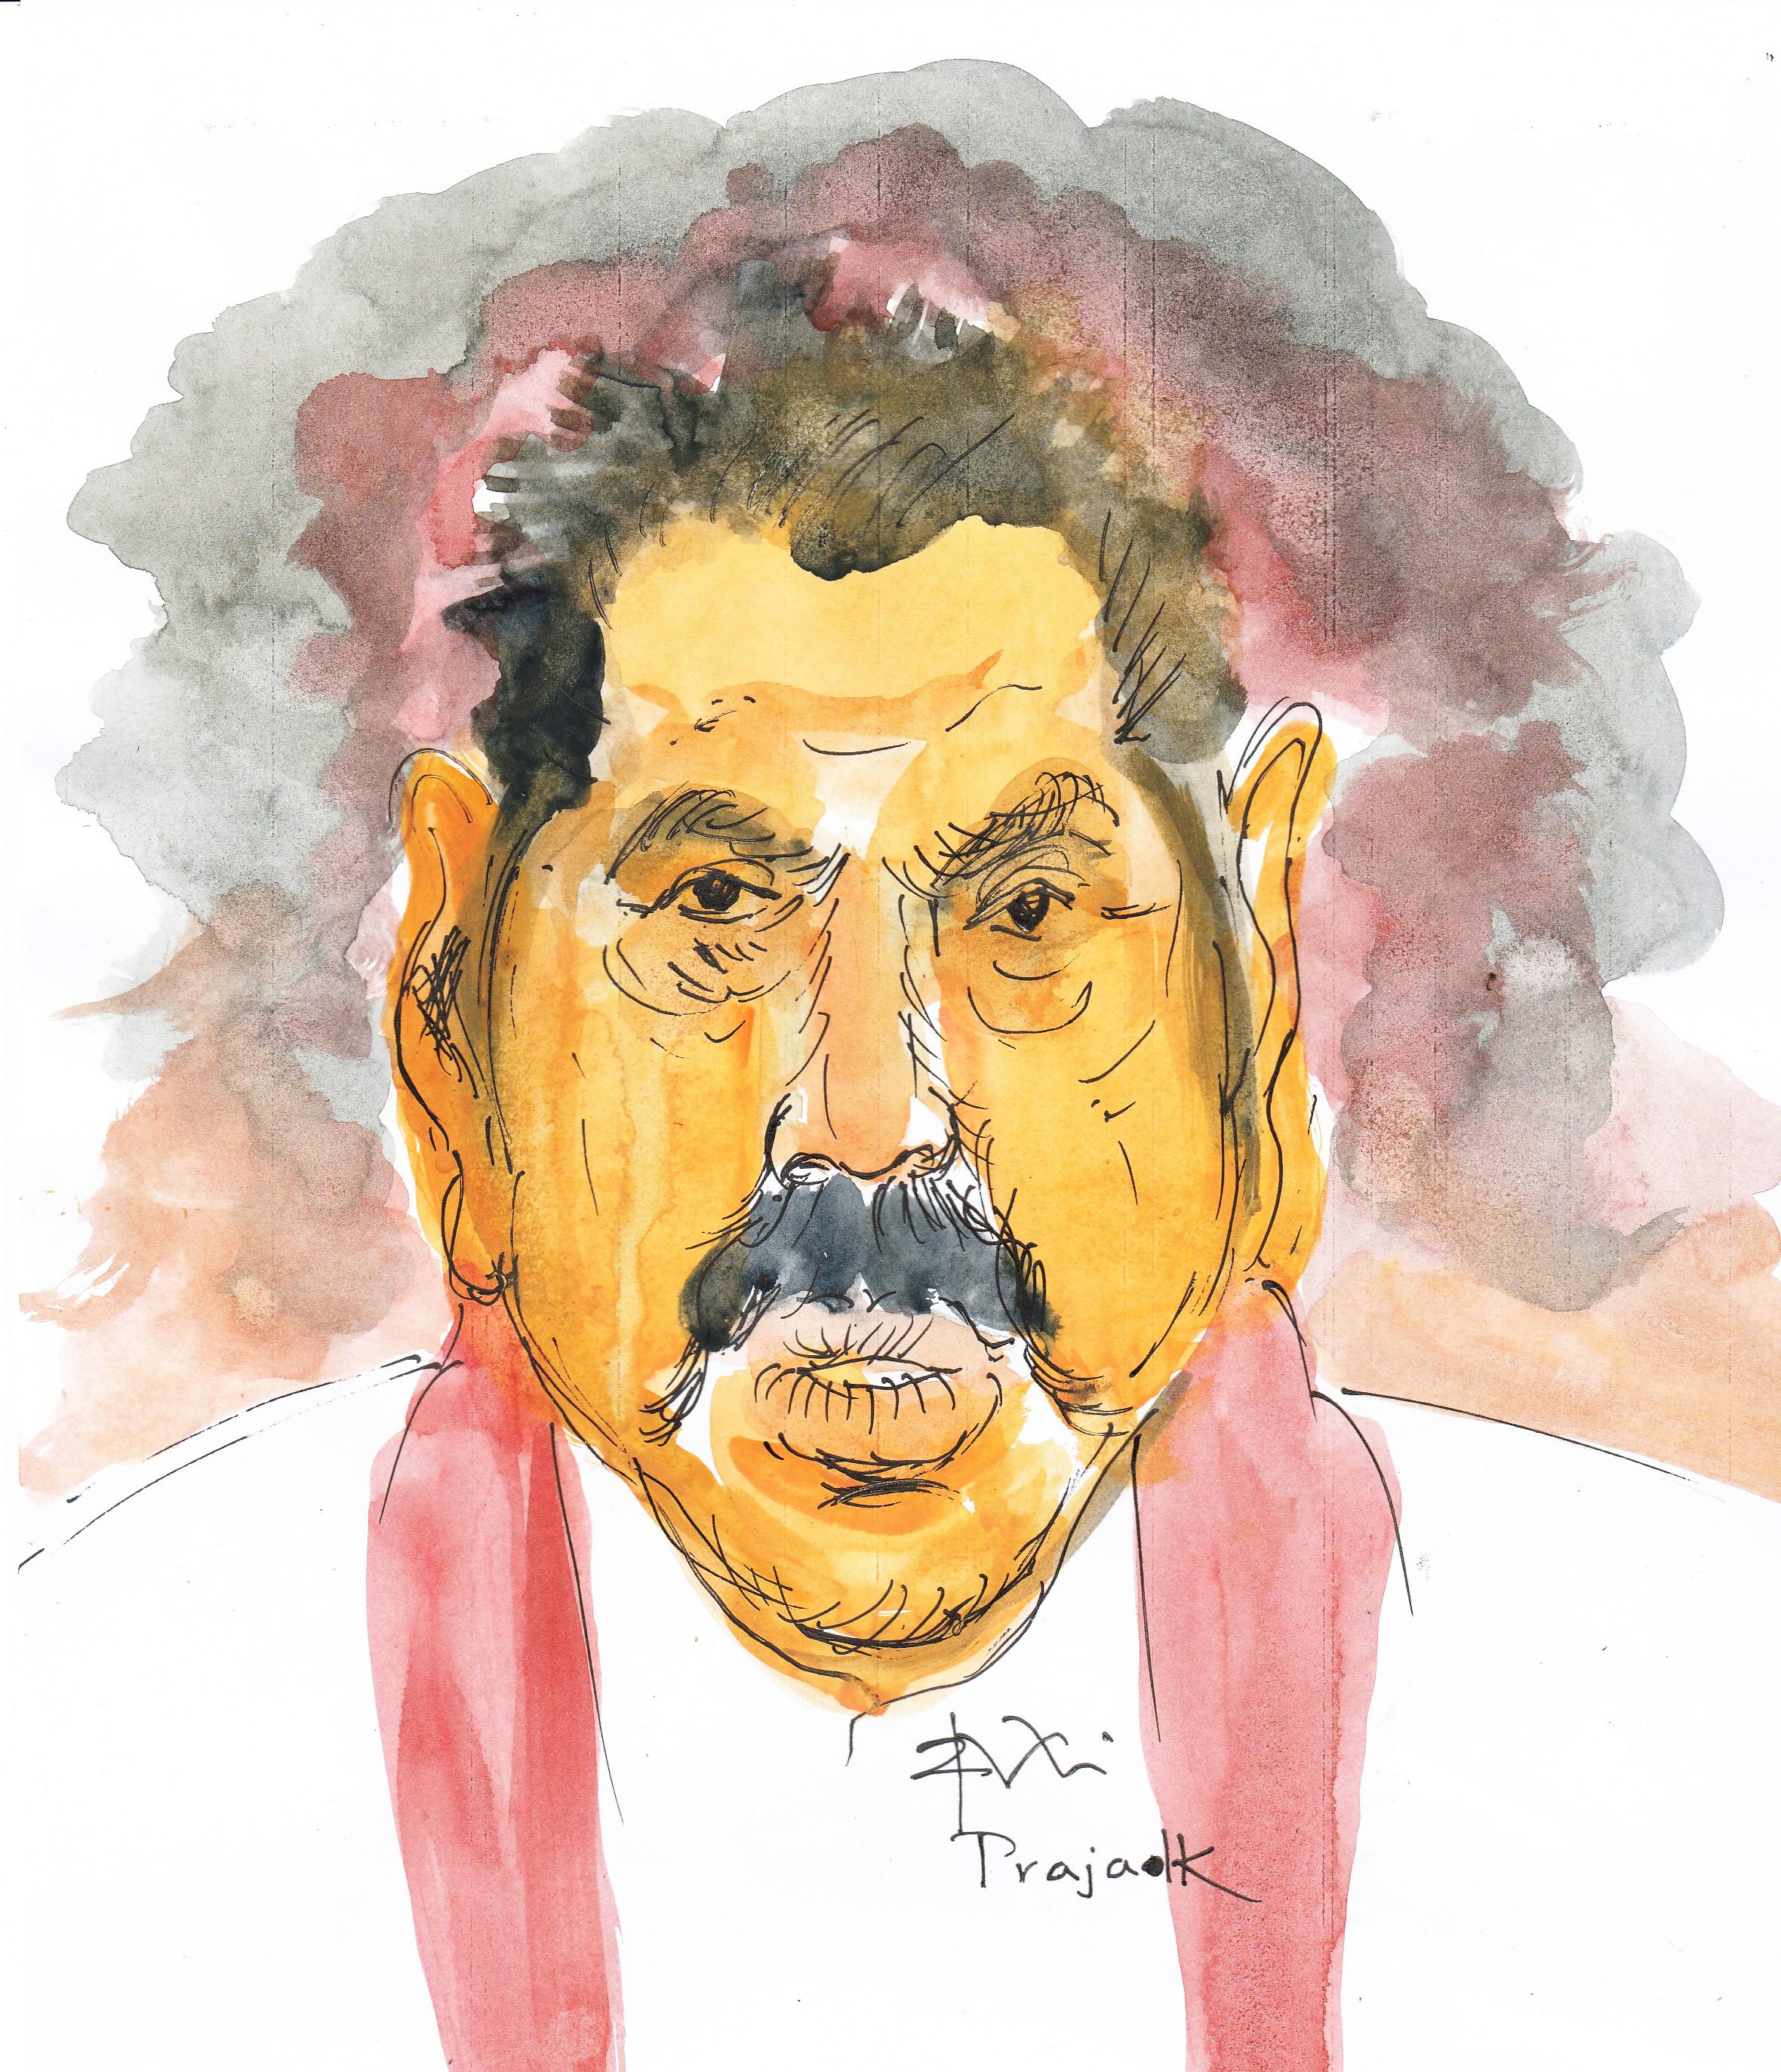 Mahinda caricature by Ajith Perakum Jayasinghe